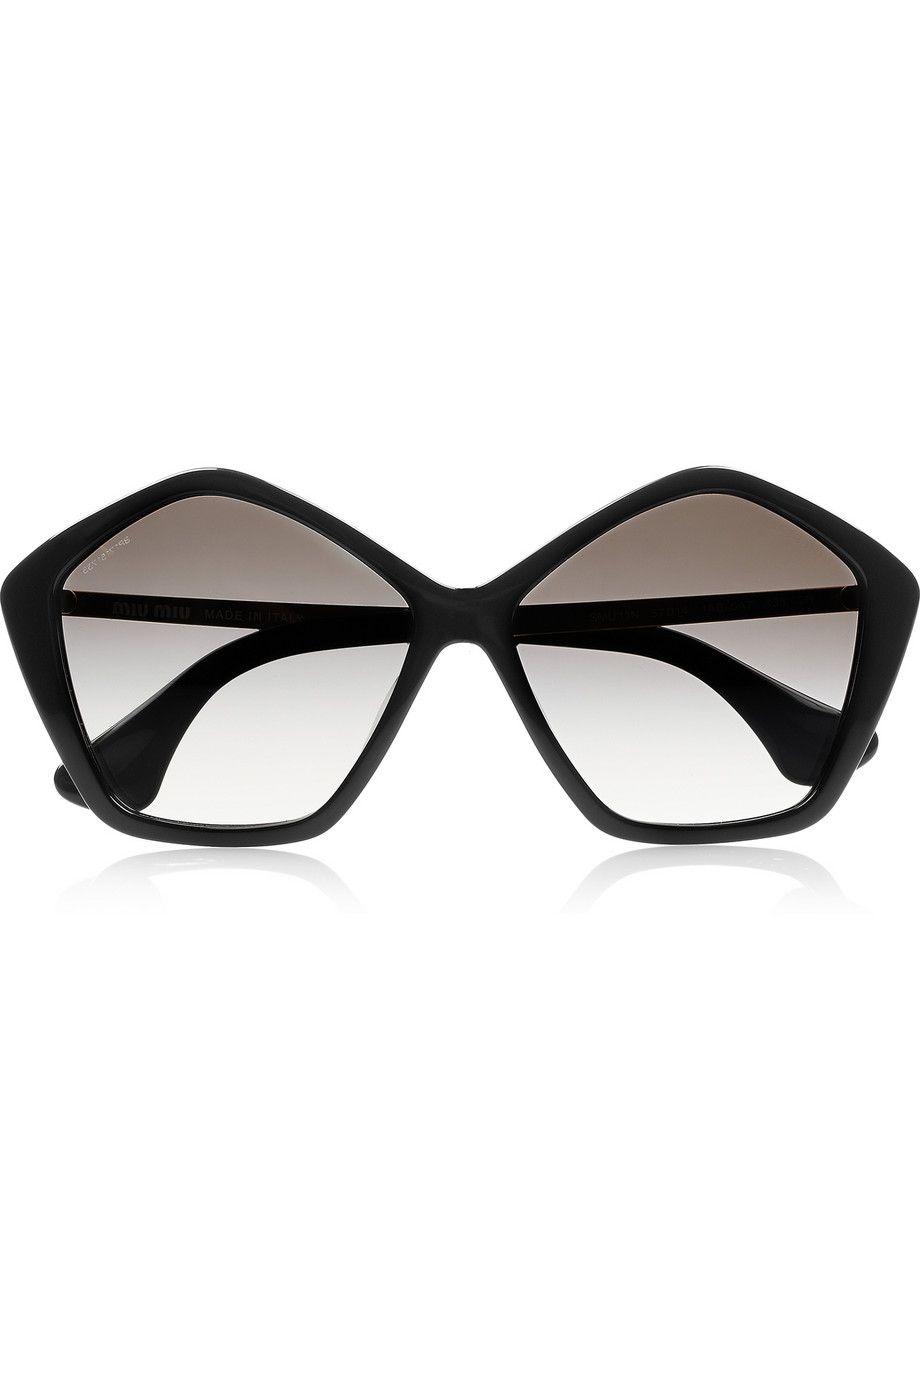 4124ceaa155f Miu Miu Pentagon-frame acetate sunglasses  TheVillage  Westfield   AutumnWinterFashion